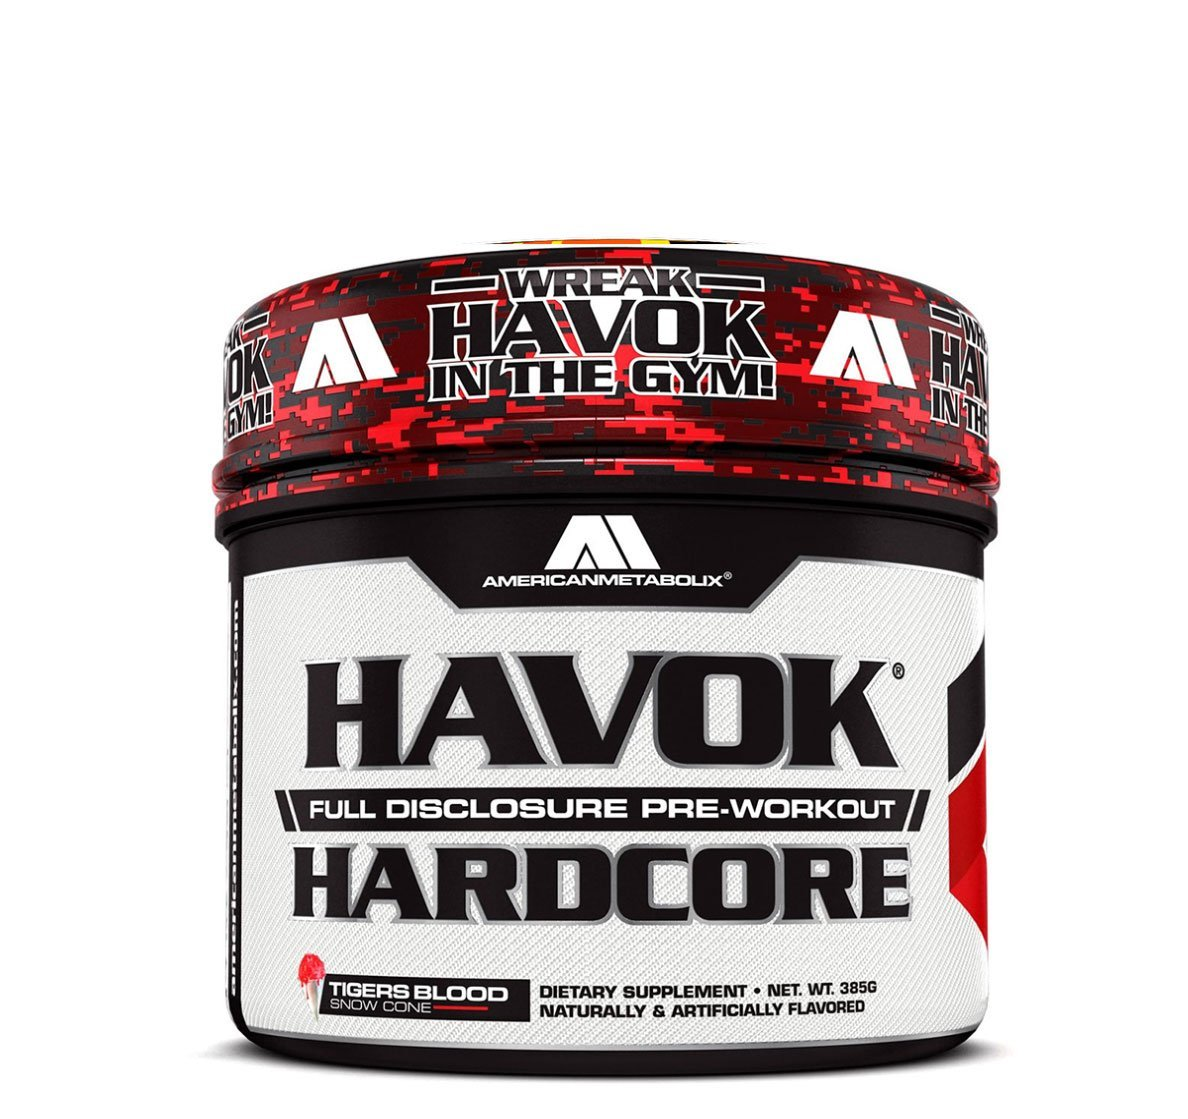 American Metabolix - Havok Hardcore - 30 Servings